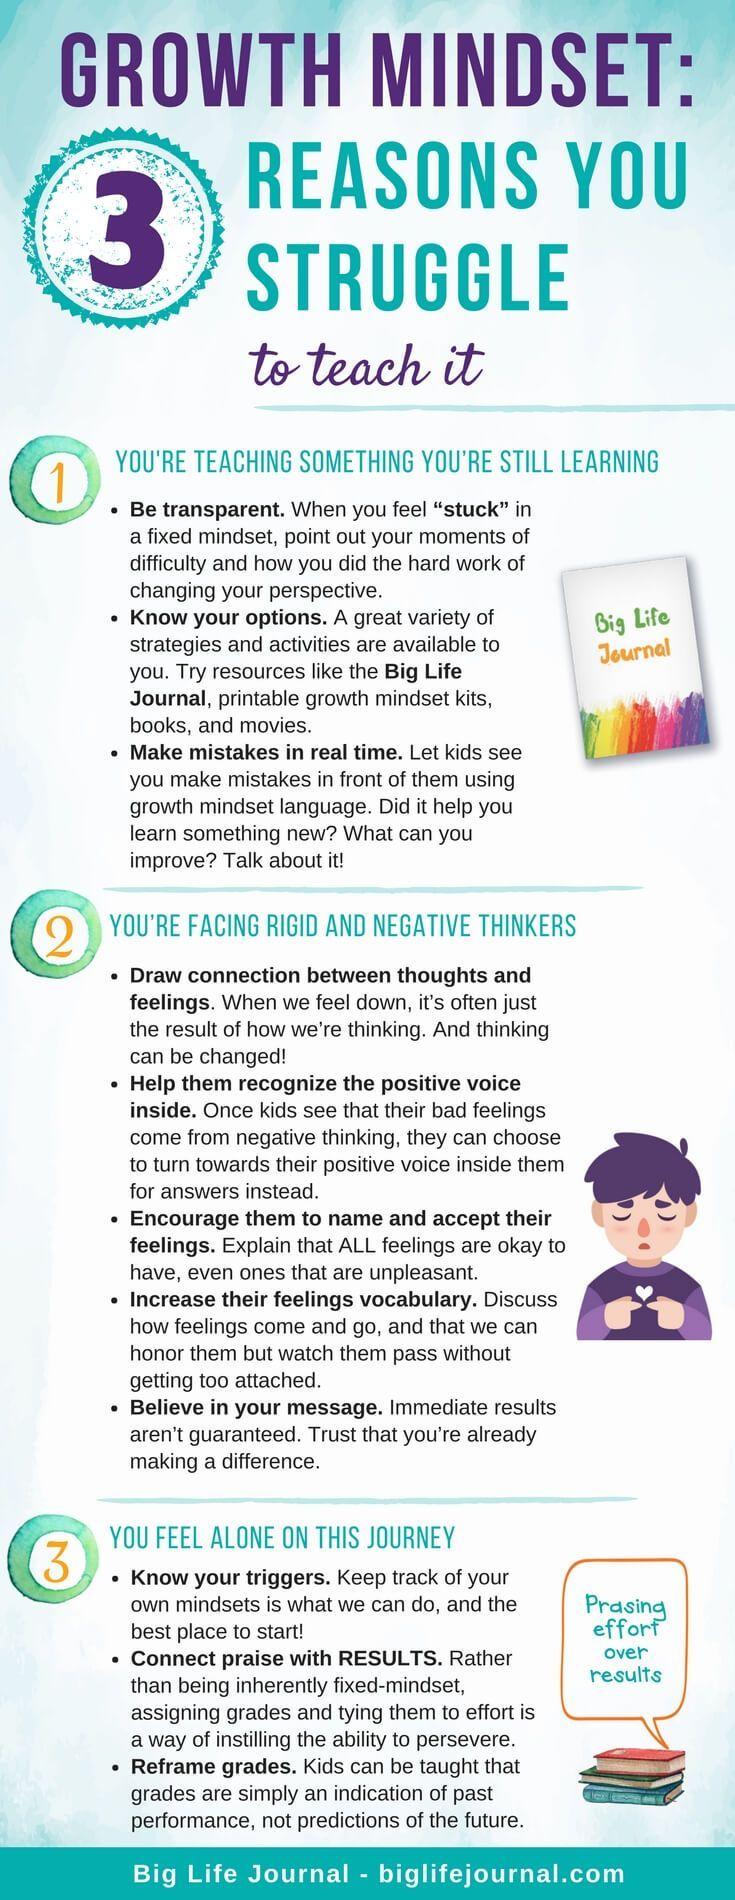 Growth Mindset: 3 Reasons You Struggle to Teach It – Big Life Journal